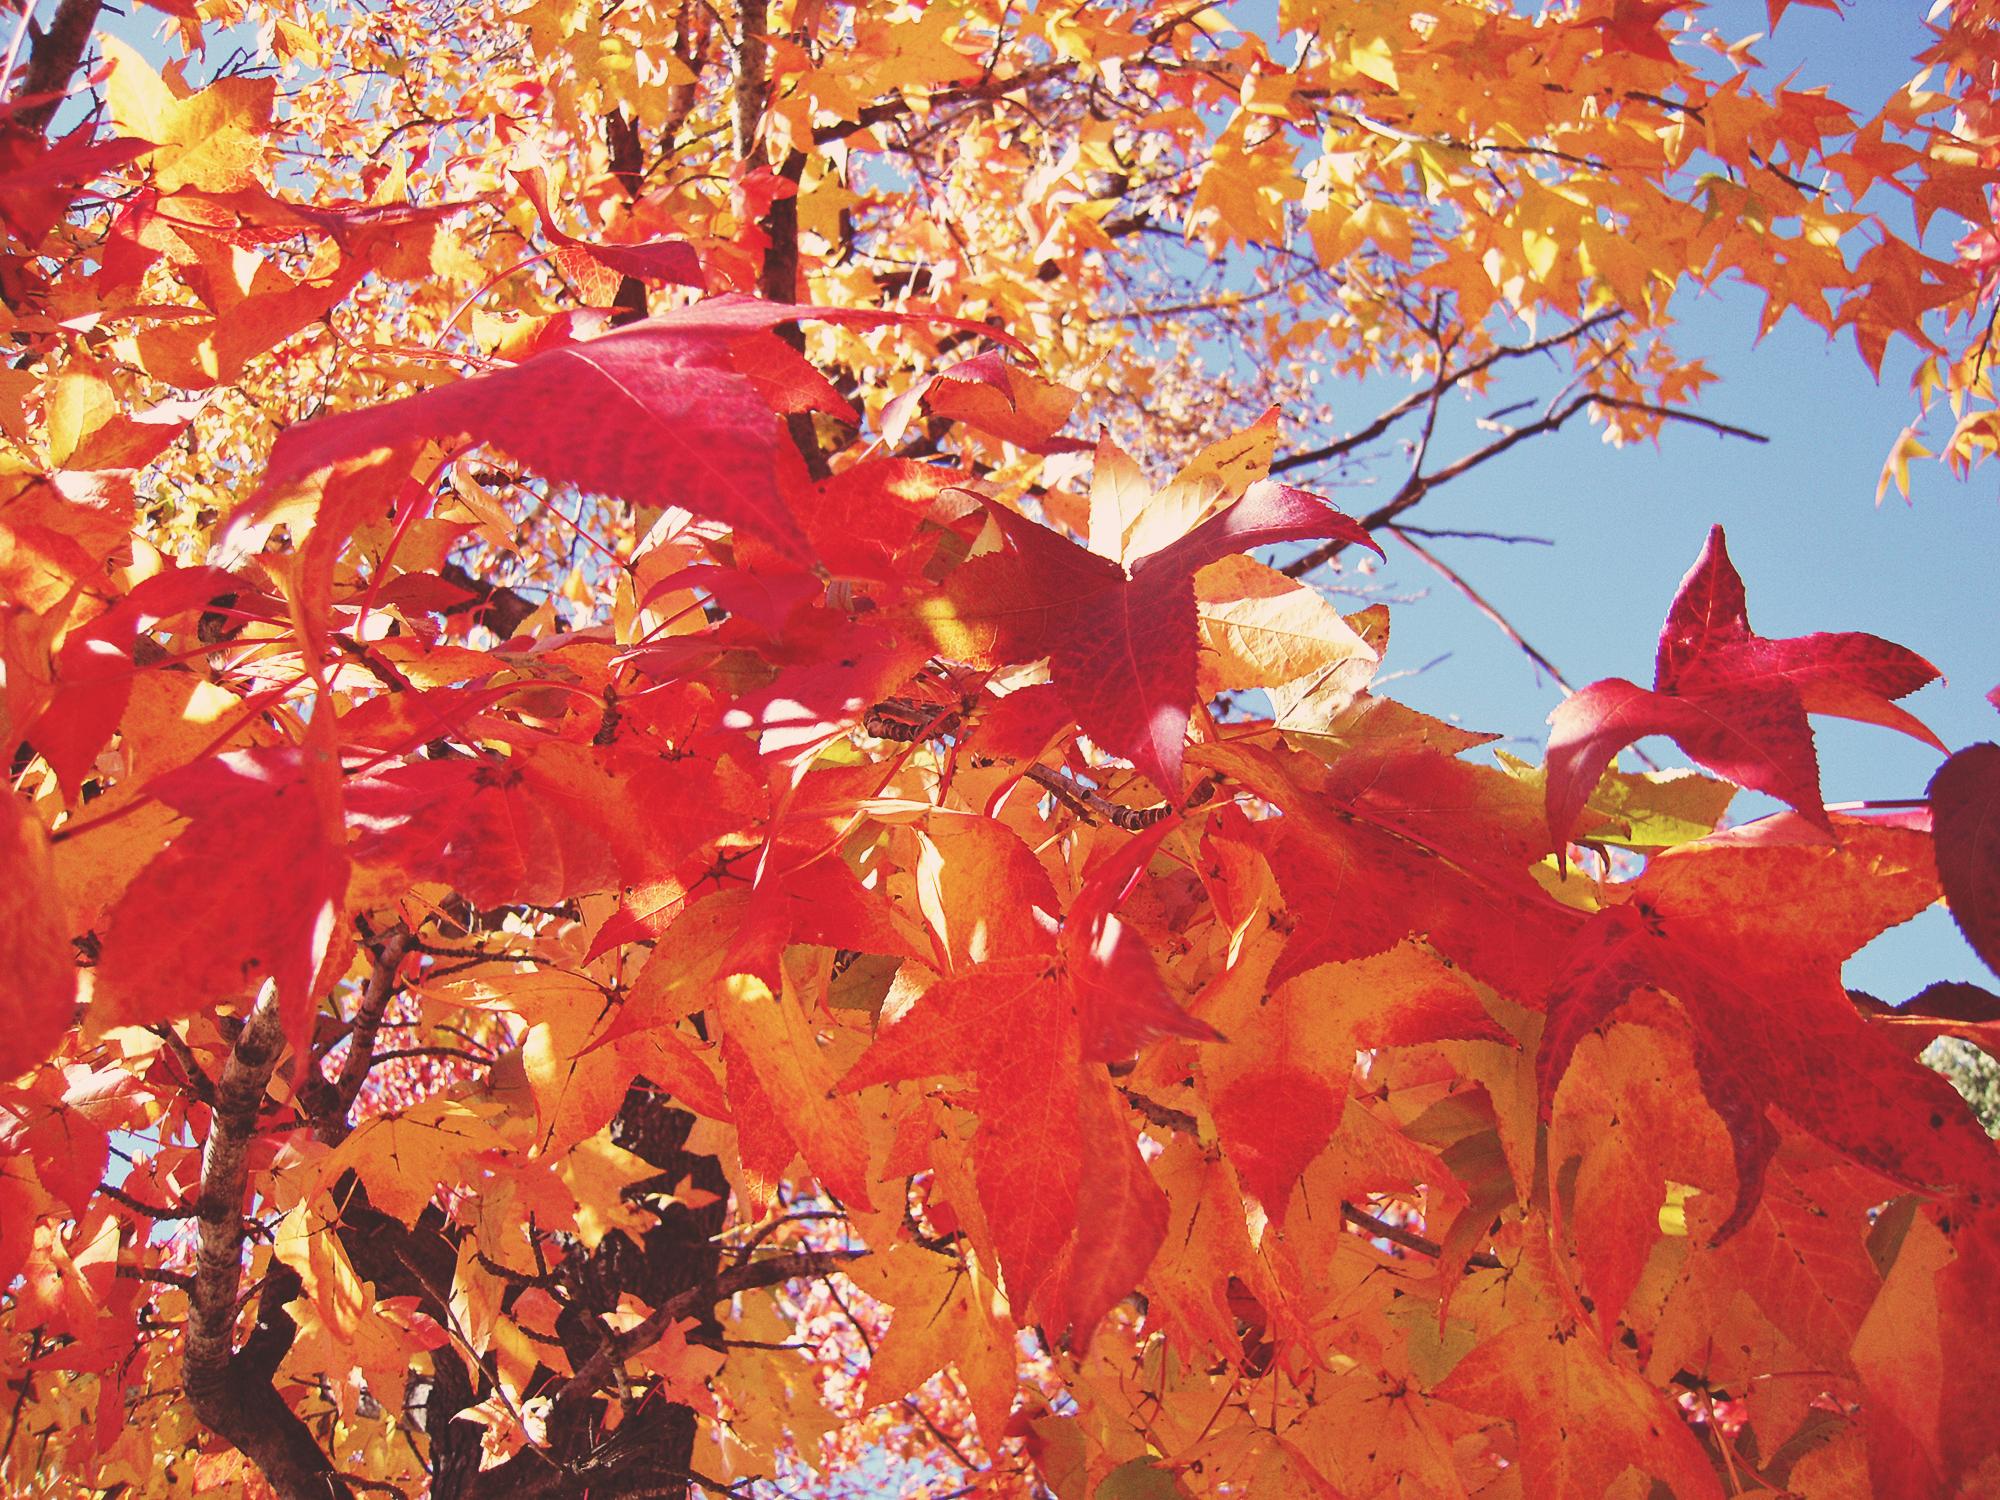 Autumn Leaves by Hillary Rain